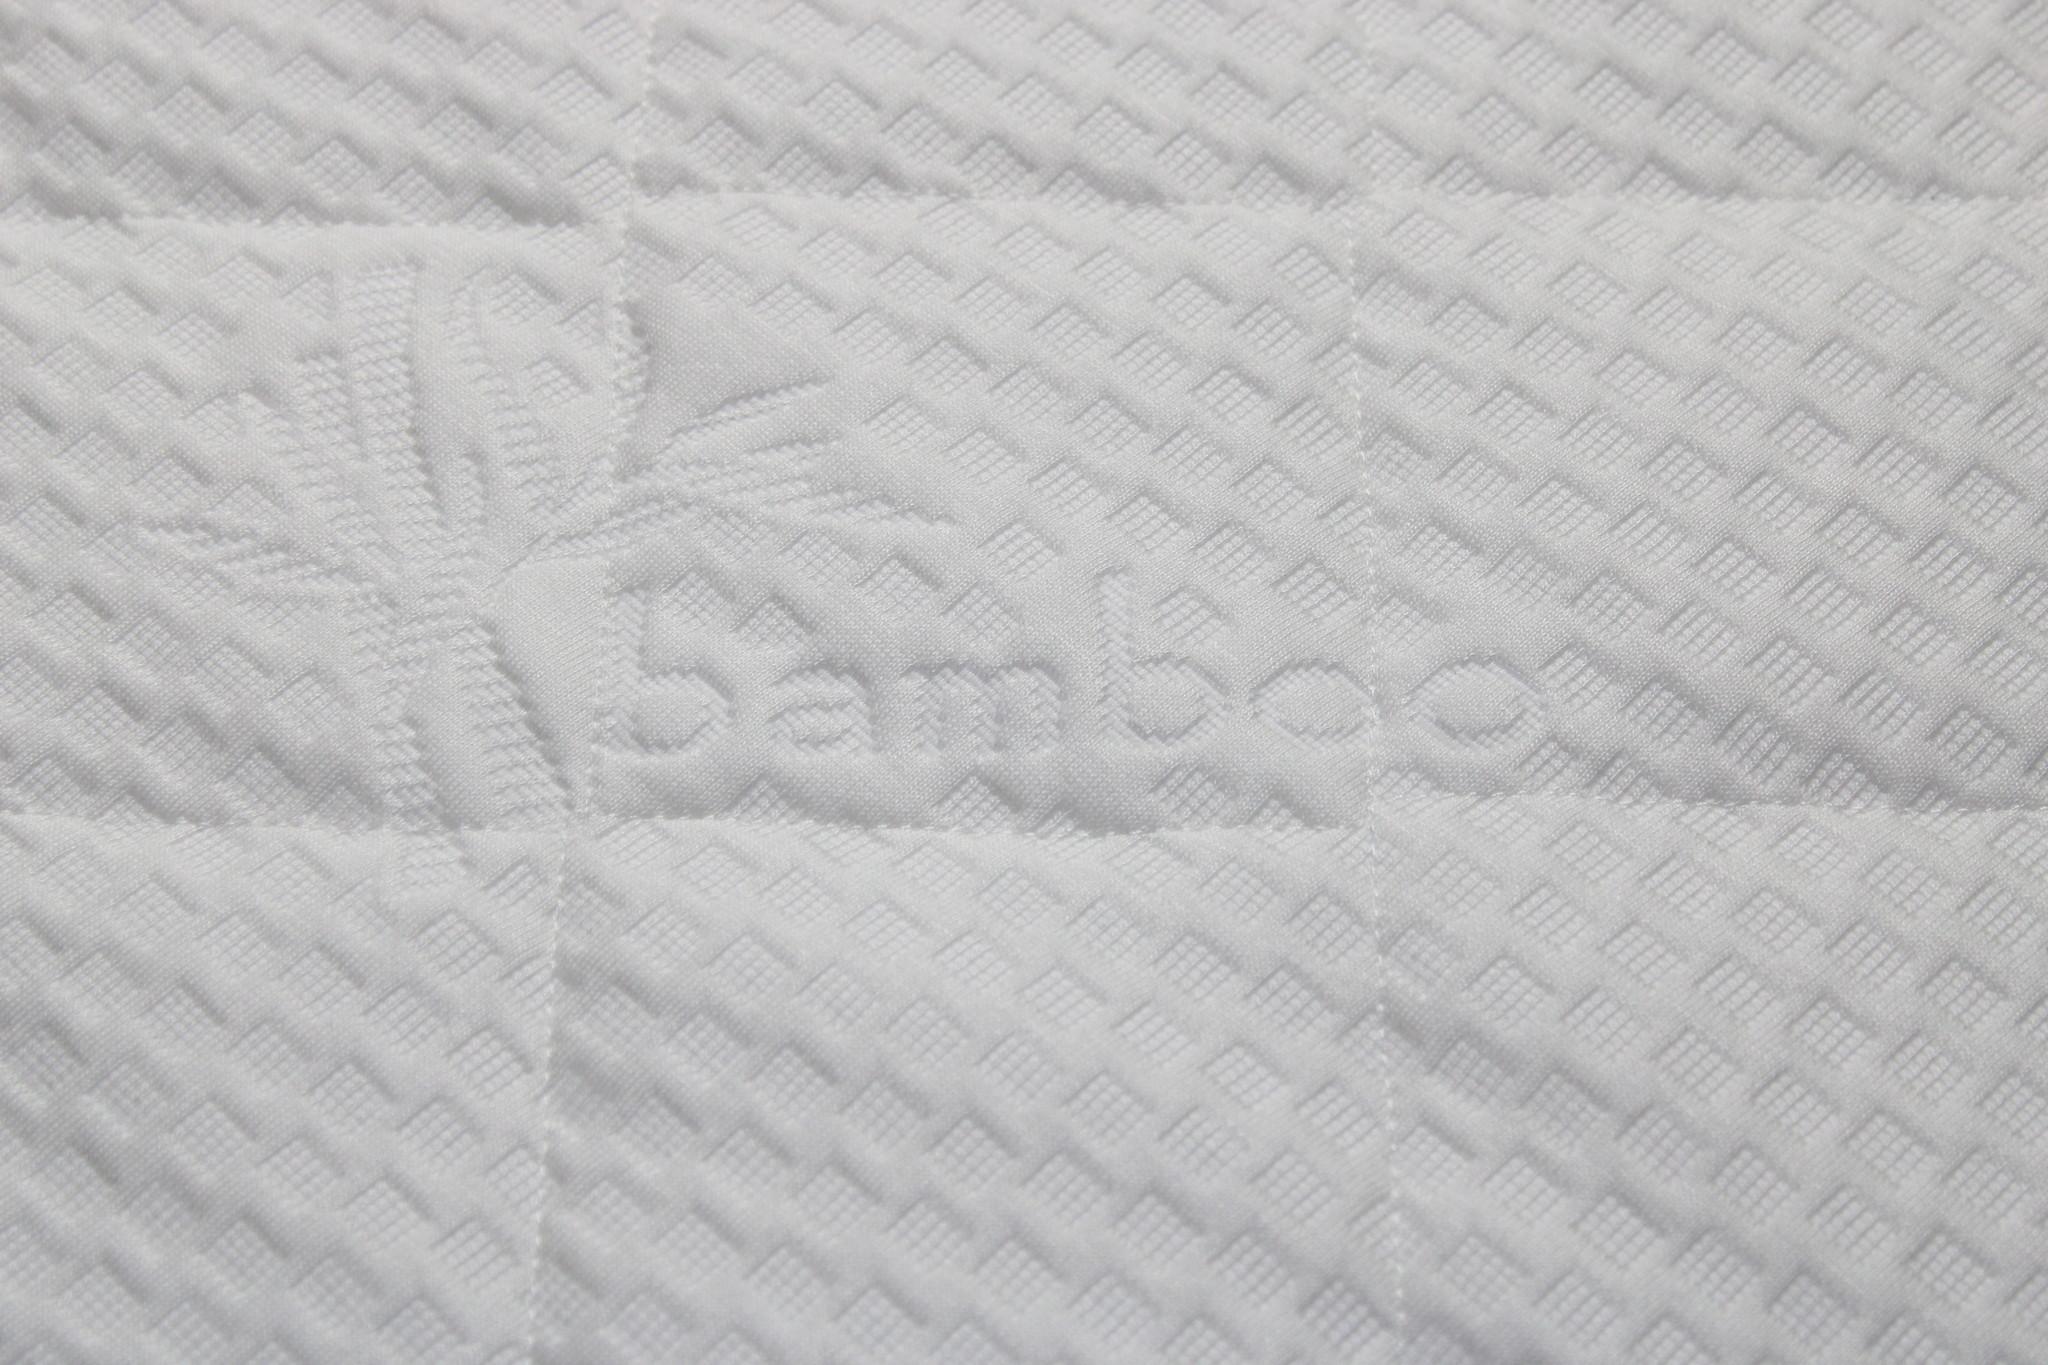 Sarpy Kindermatras 90x175 koudschuim HR55 bamboo